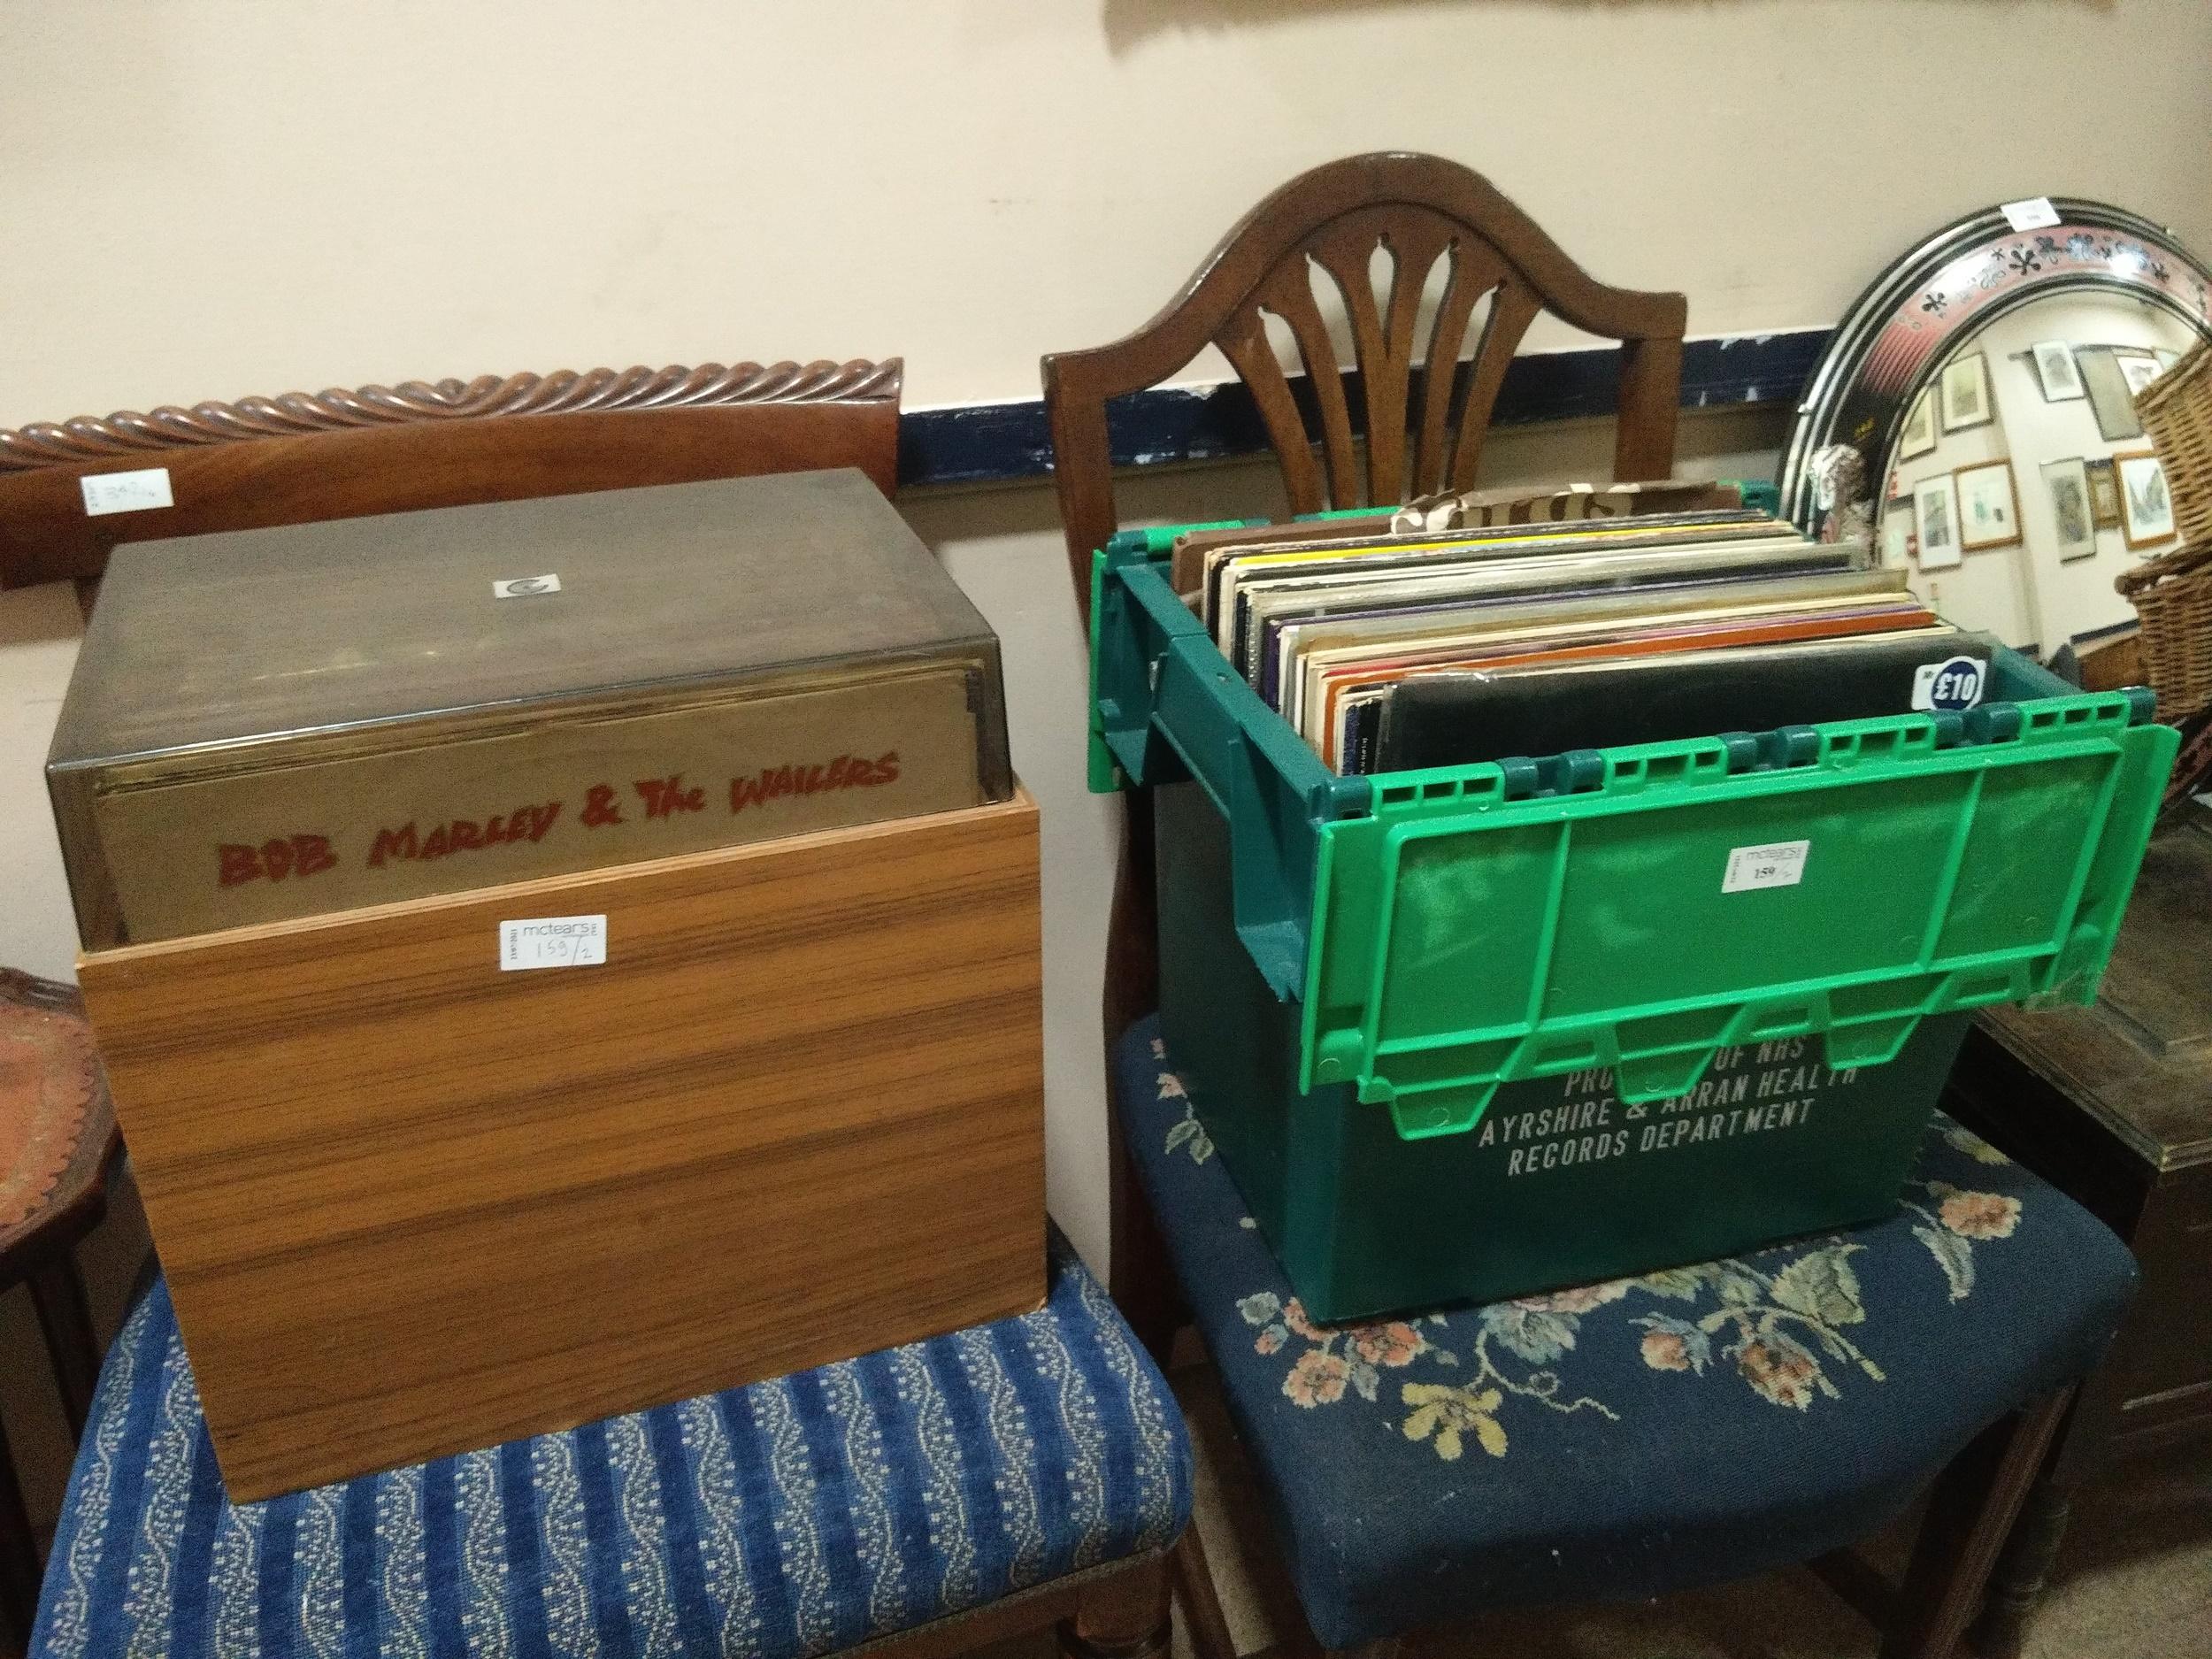 A LOT OF LP RECORDS